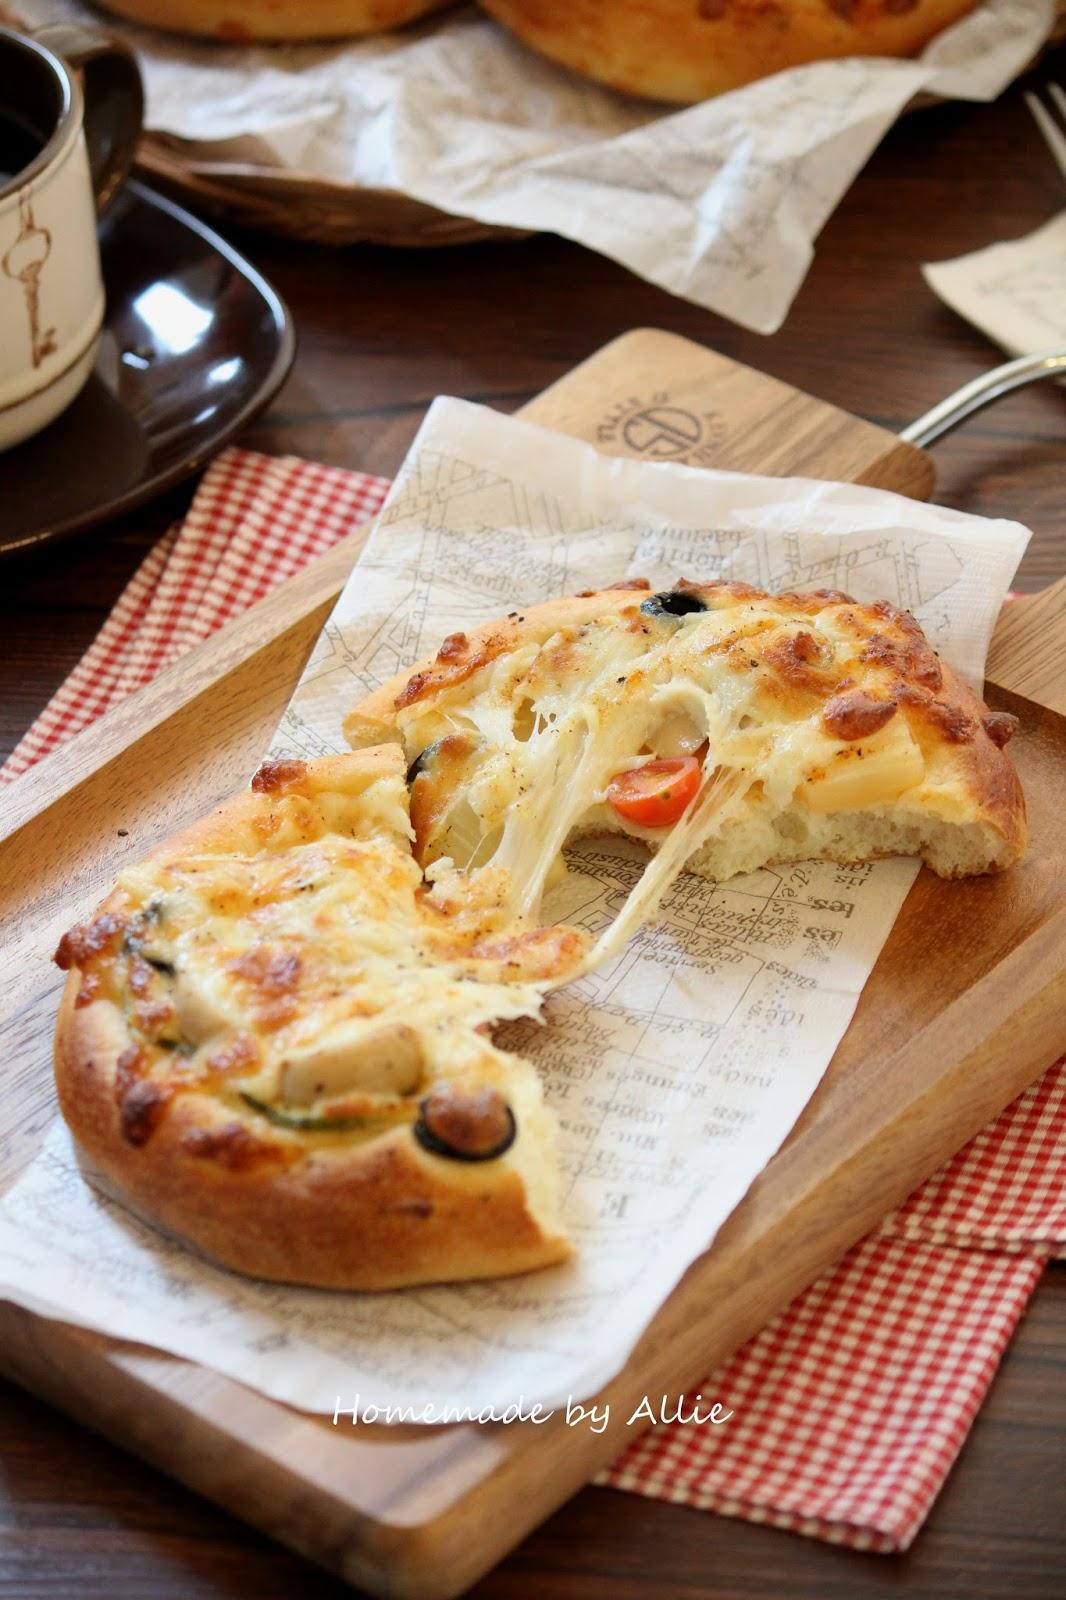 Allie's private paradise: Pizza Bread